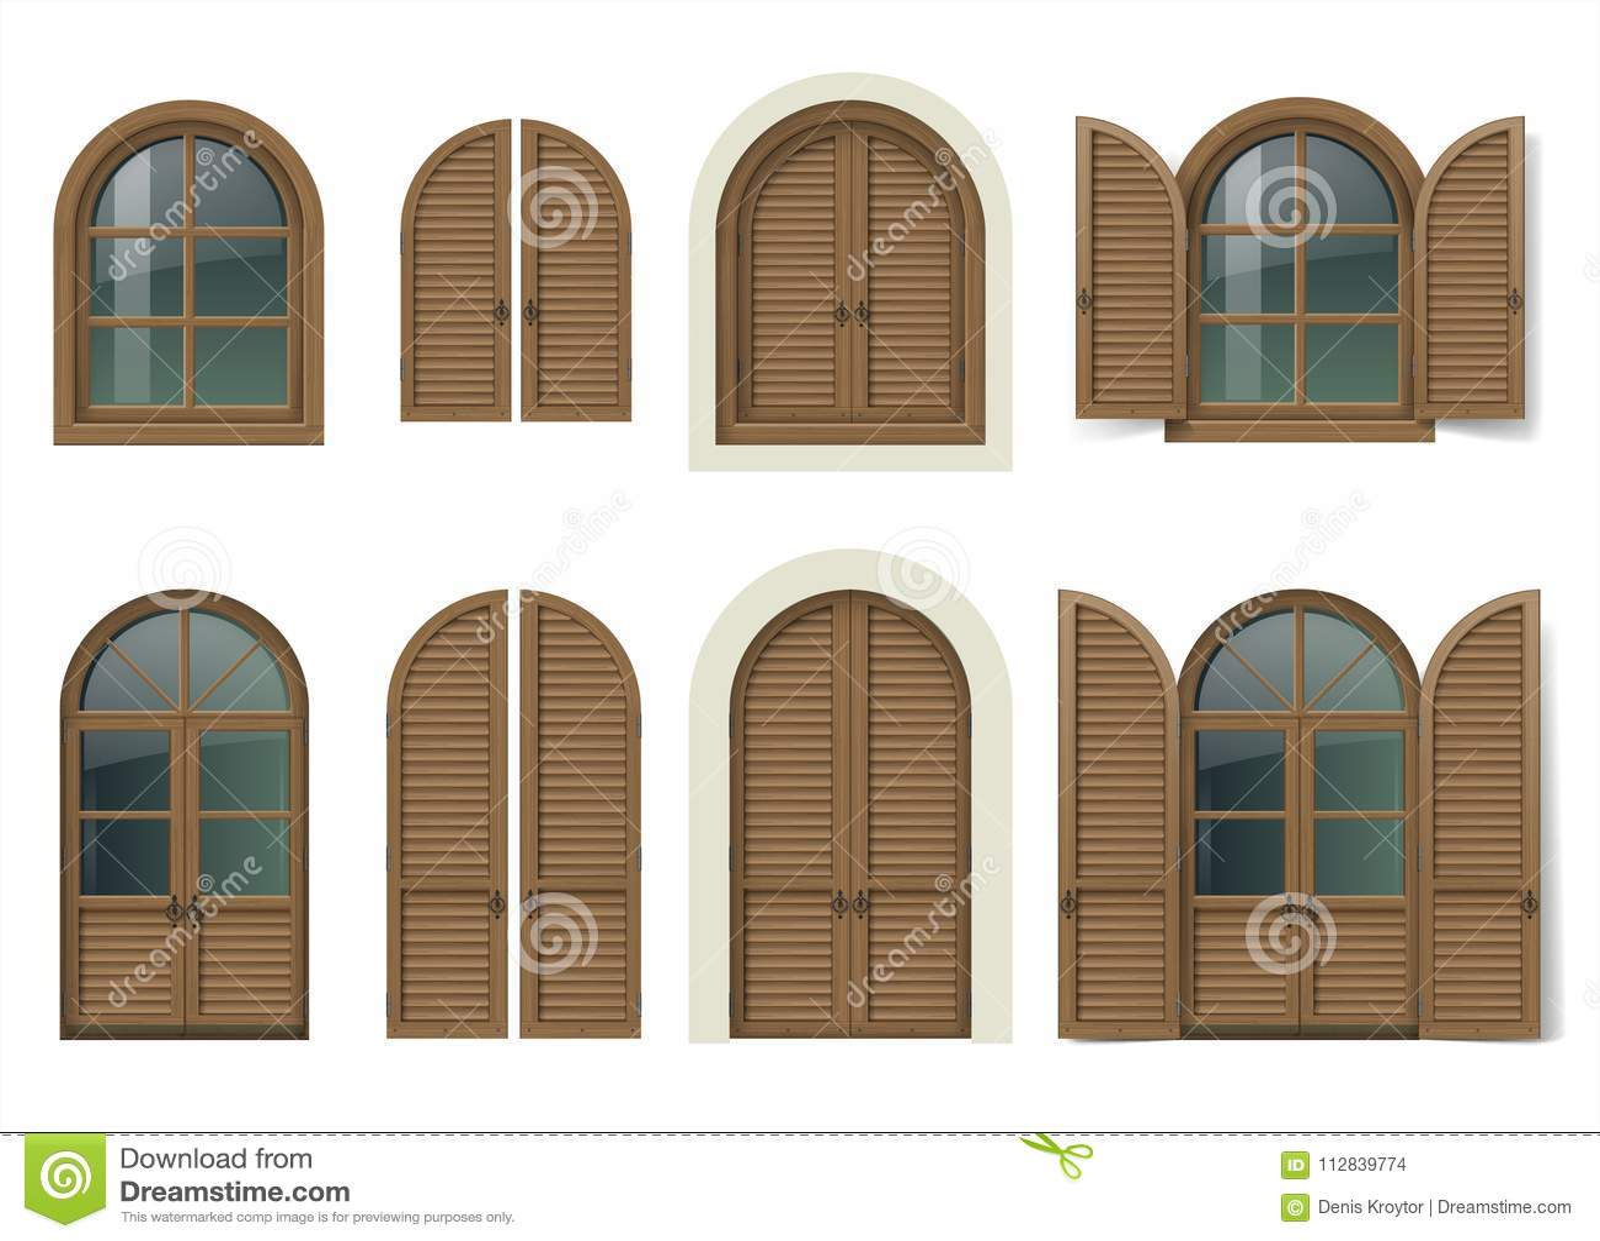 Wooden Window And Doors With Shutters Stock Vector